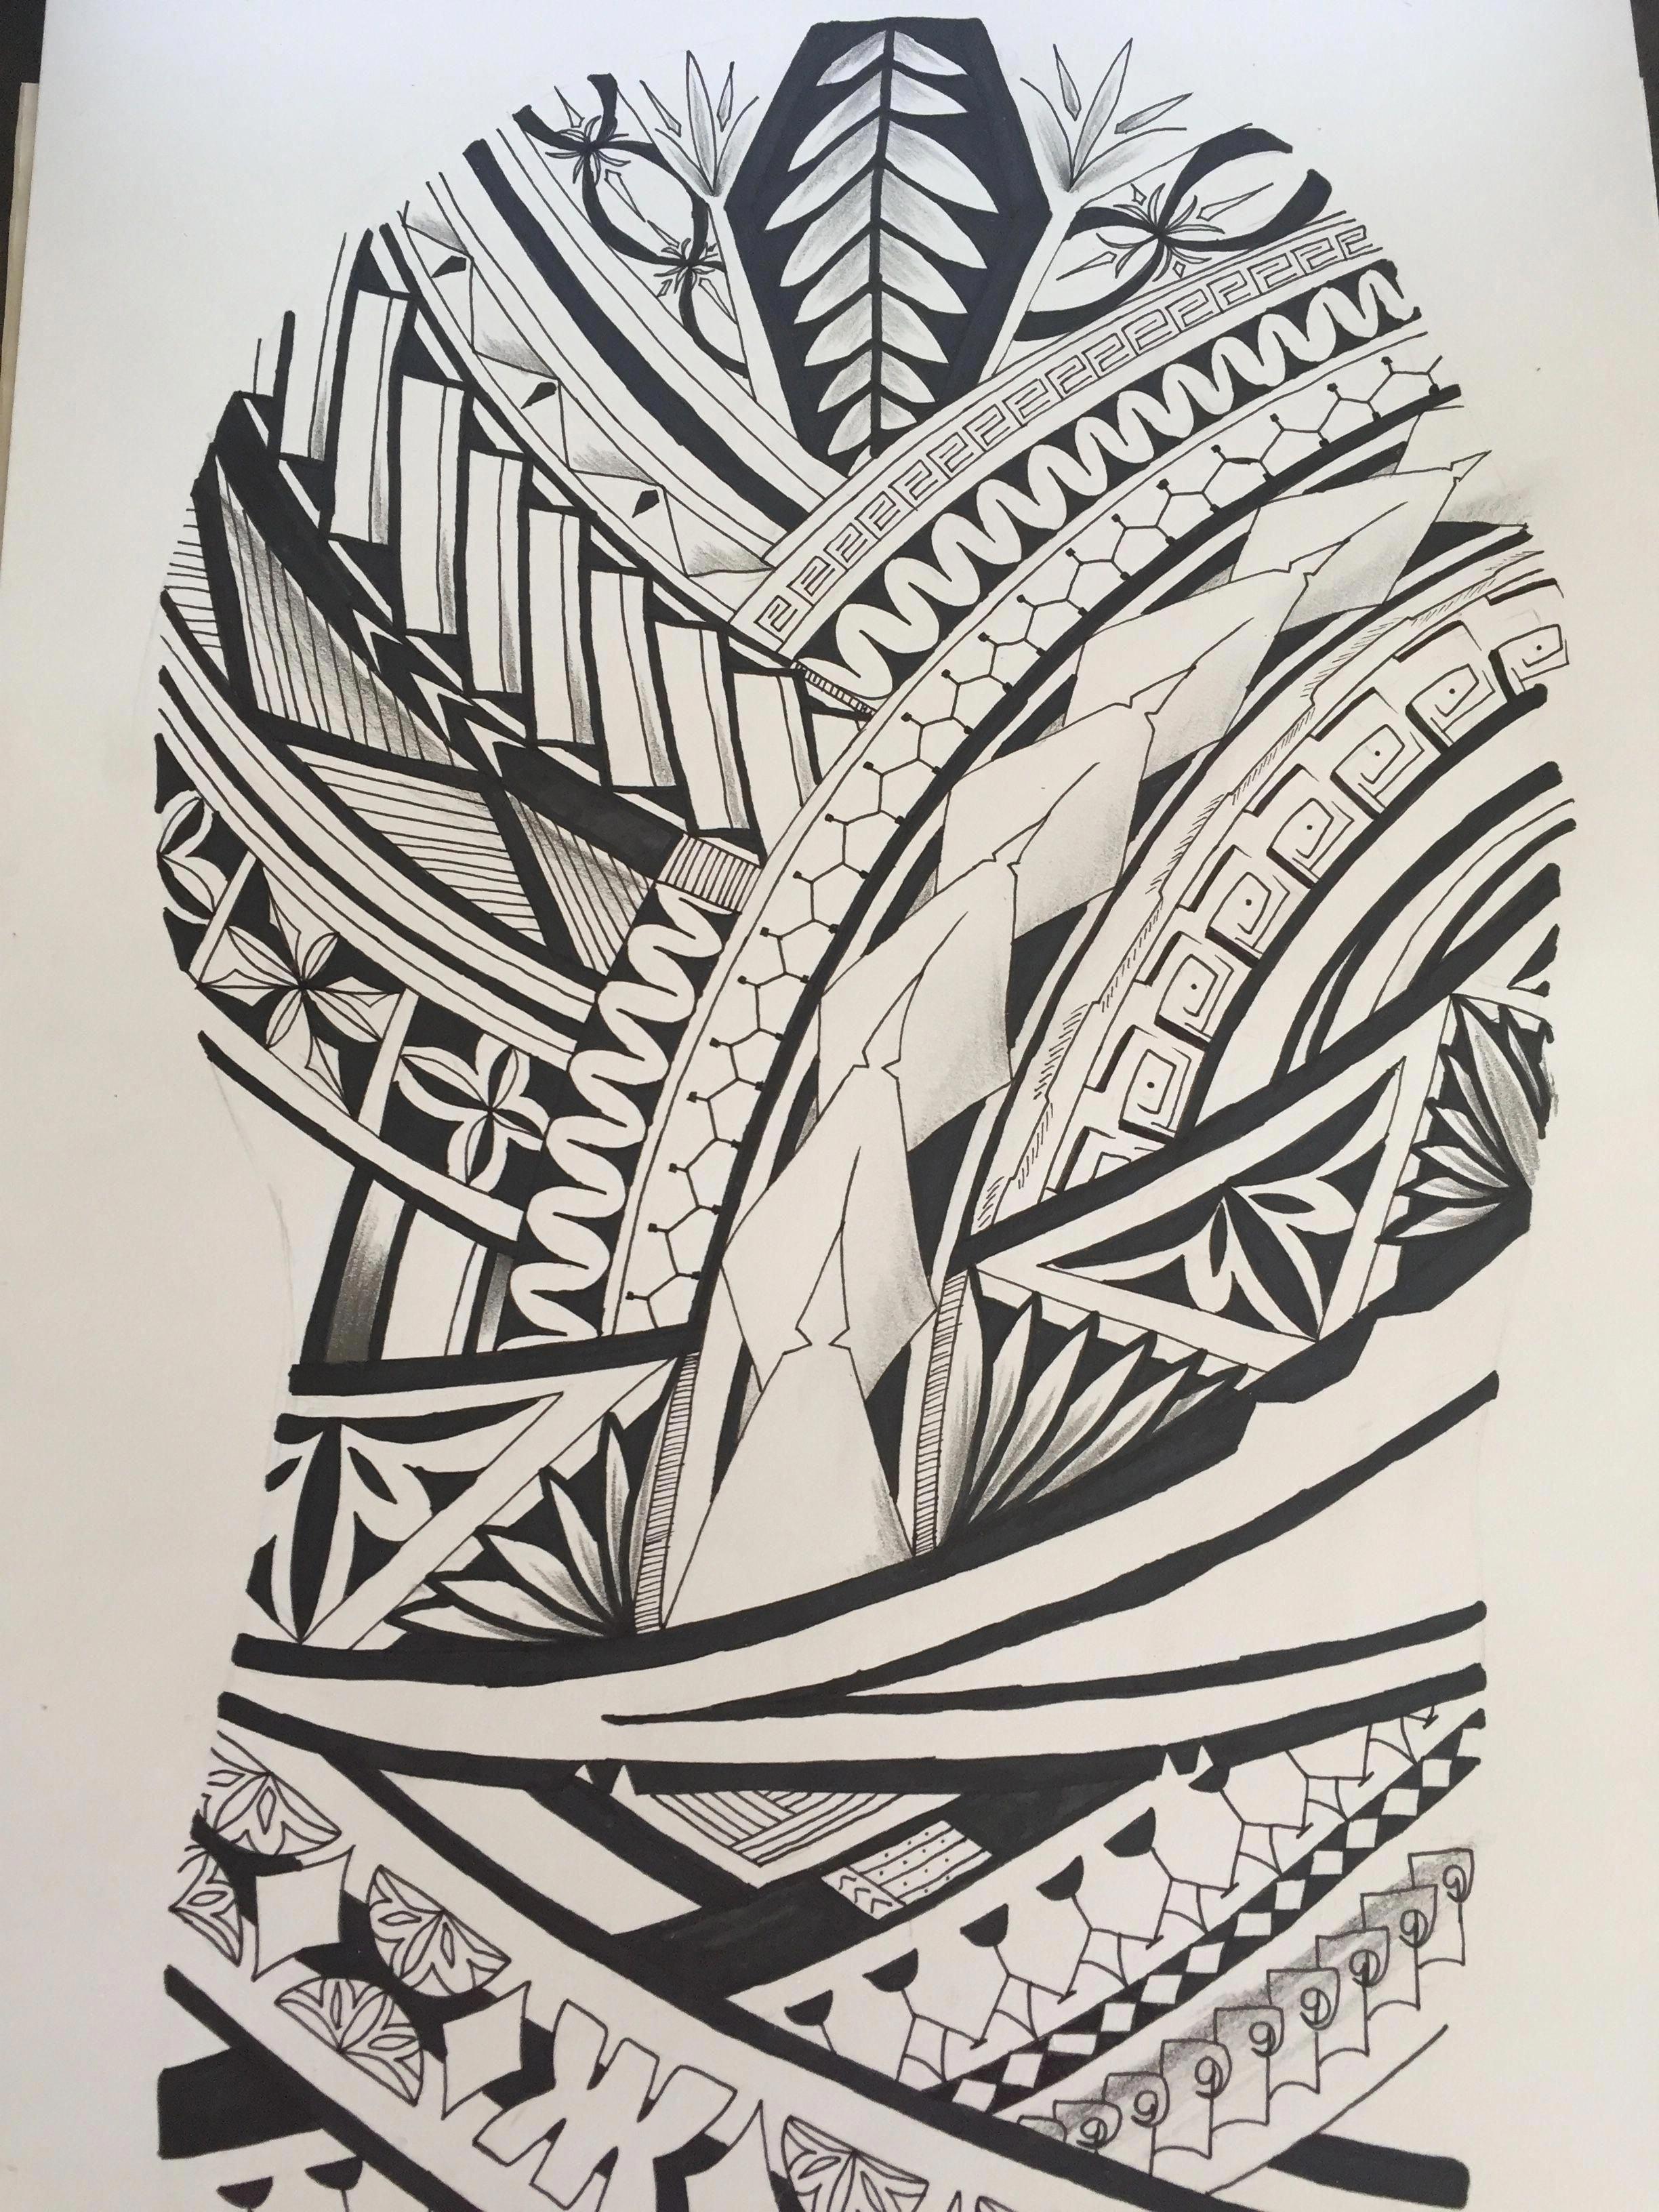 Polynesian Tattoos Meaning Strength And Courage Polynesiantattoos Polynesian Tattoo Meanings Filipino Tattoos Maori Tattoo